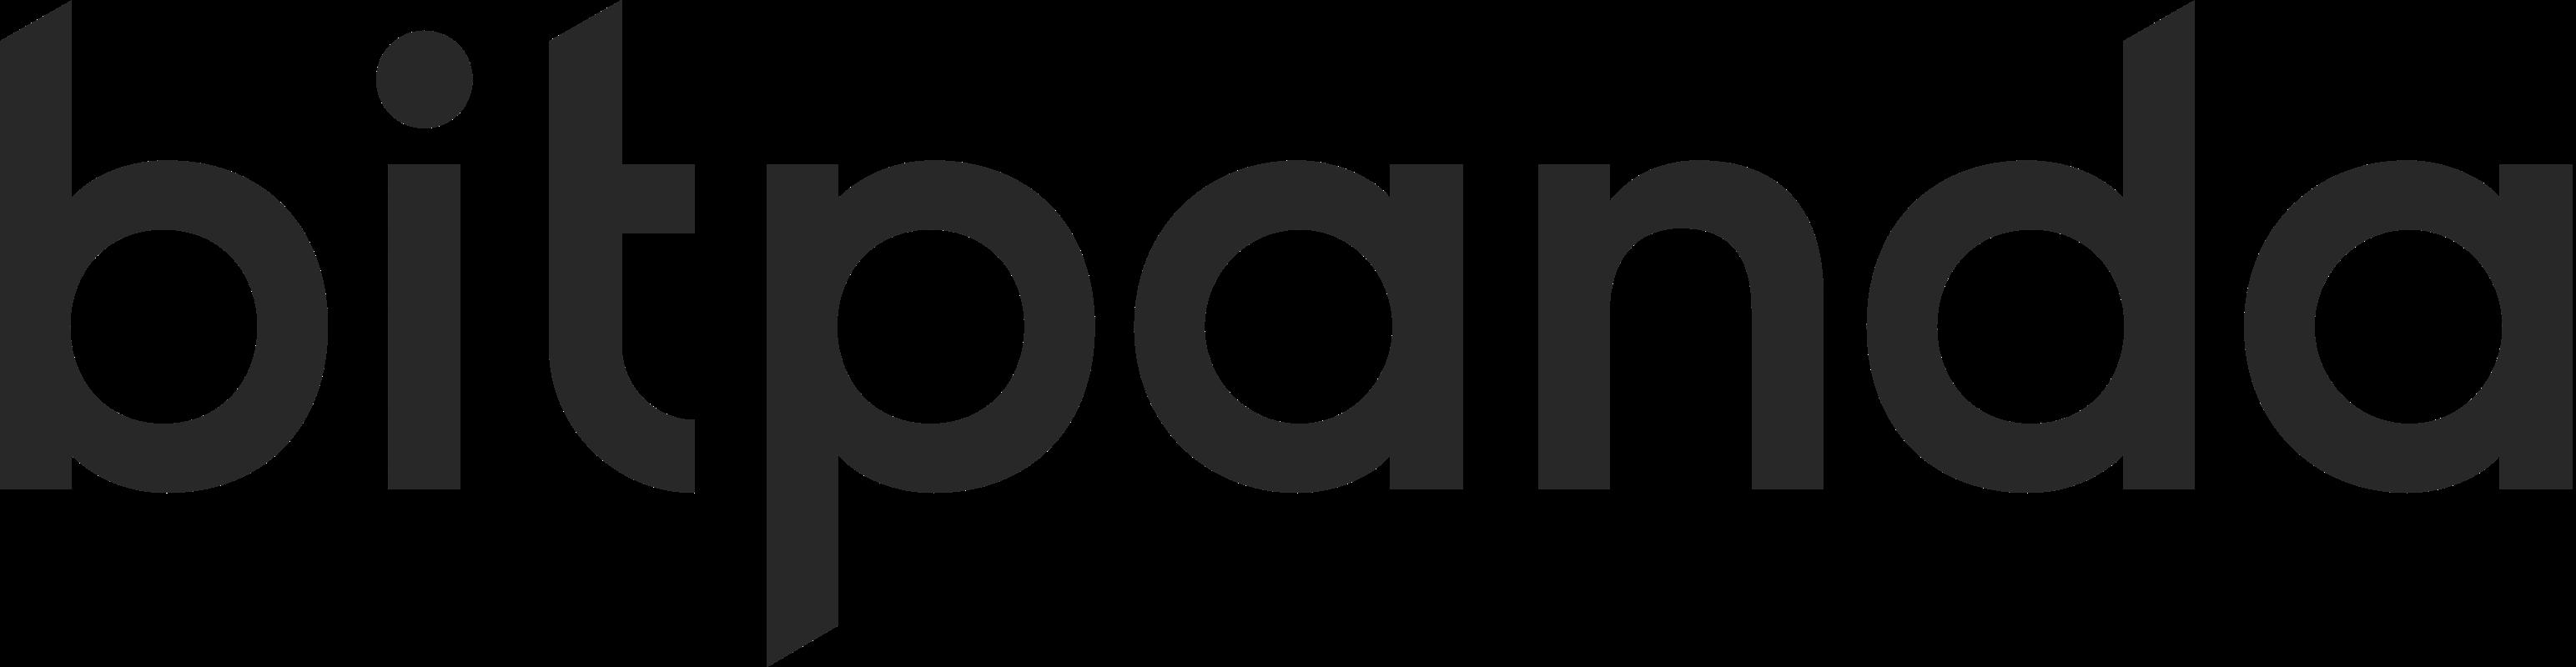 Bitpanda broker logo